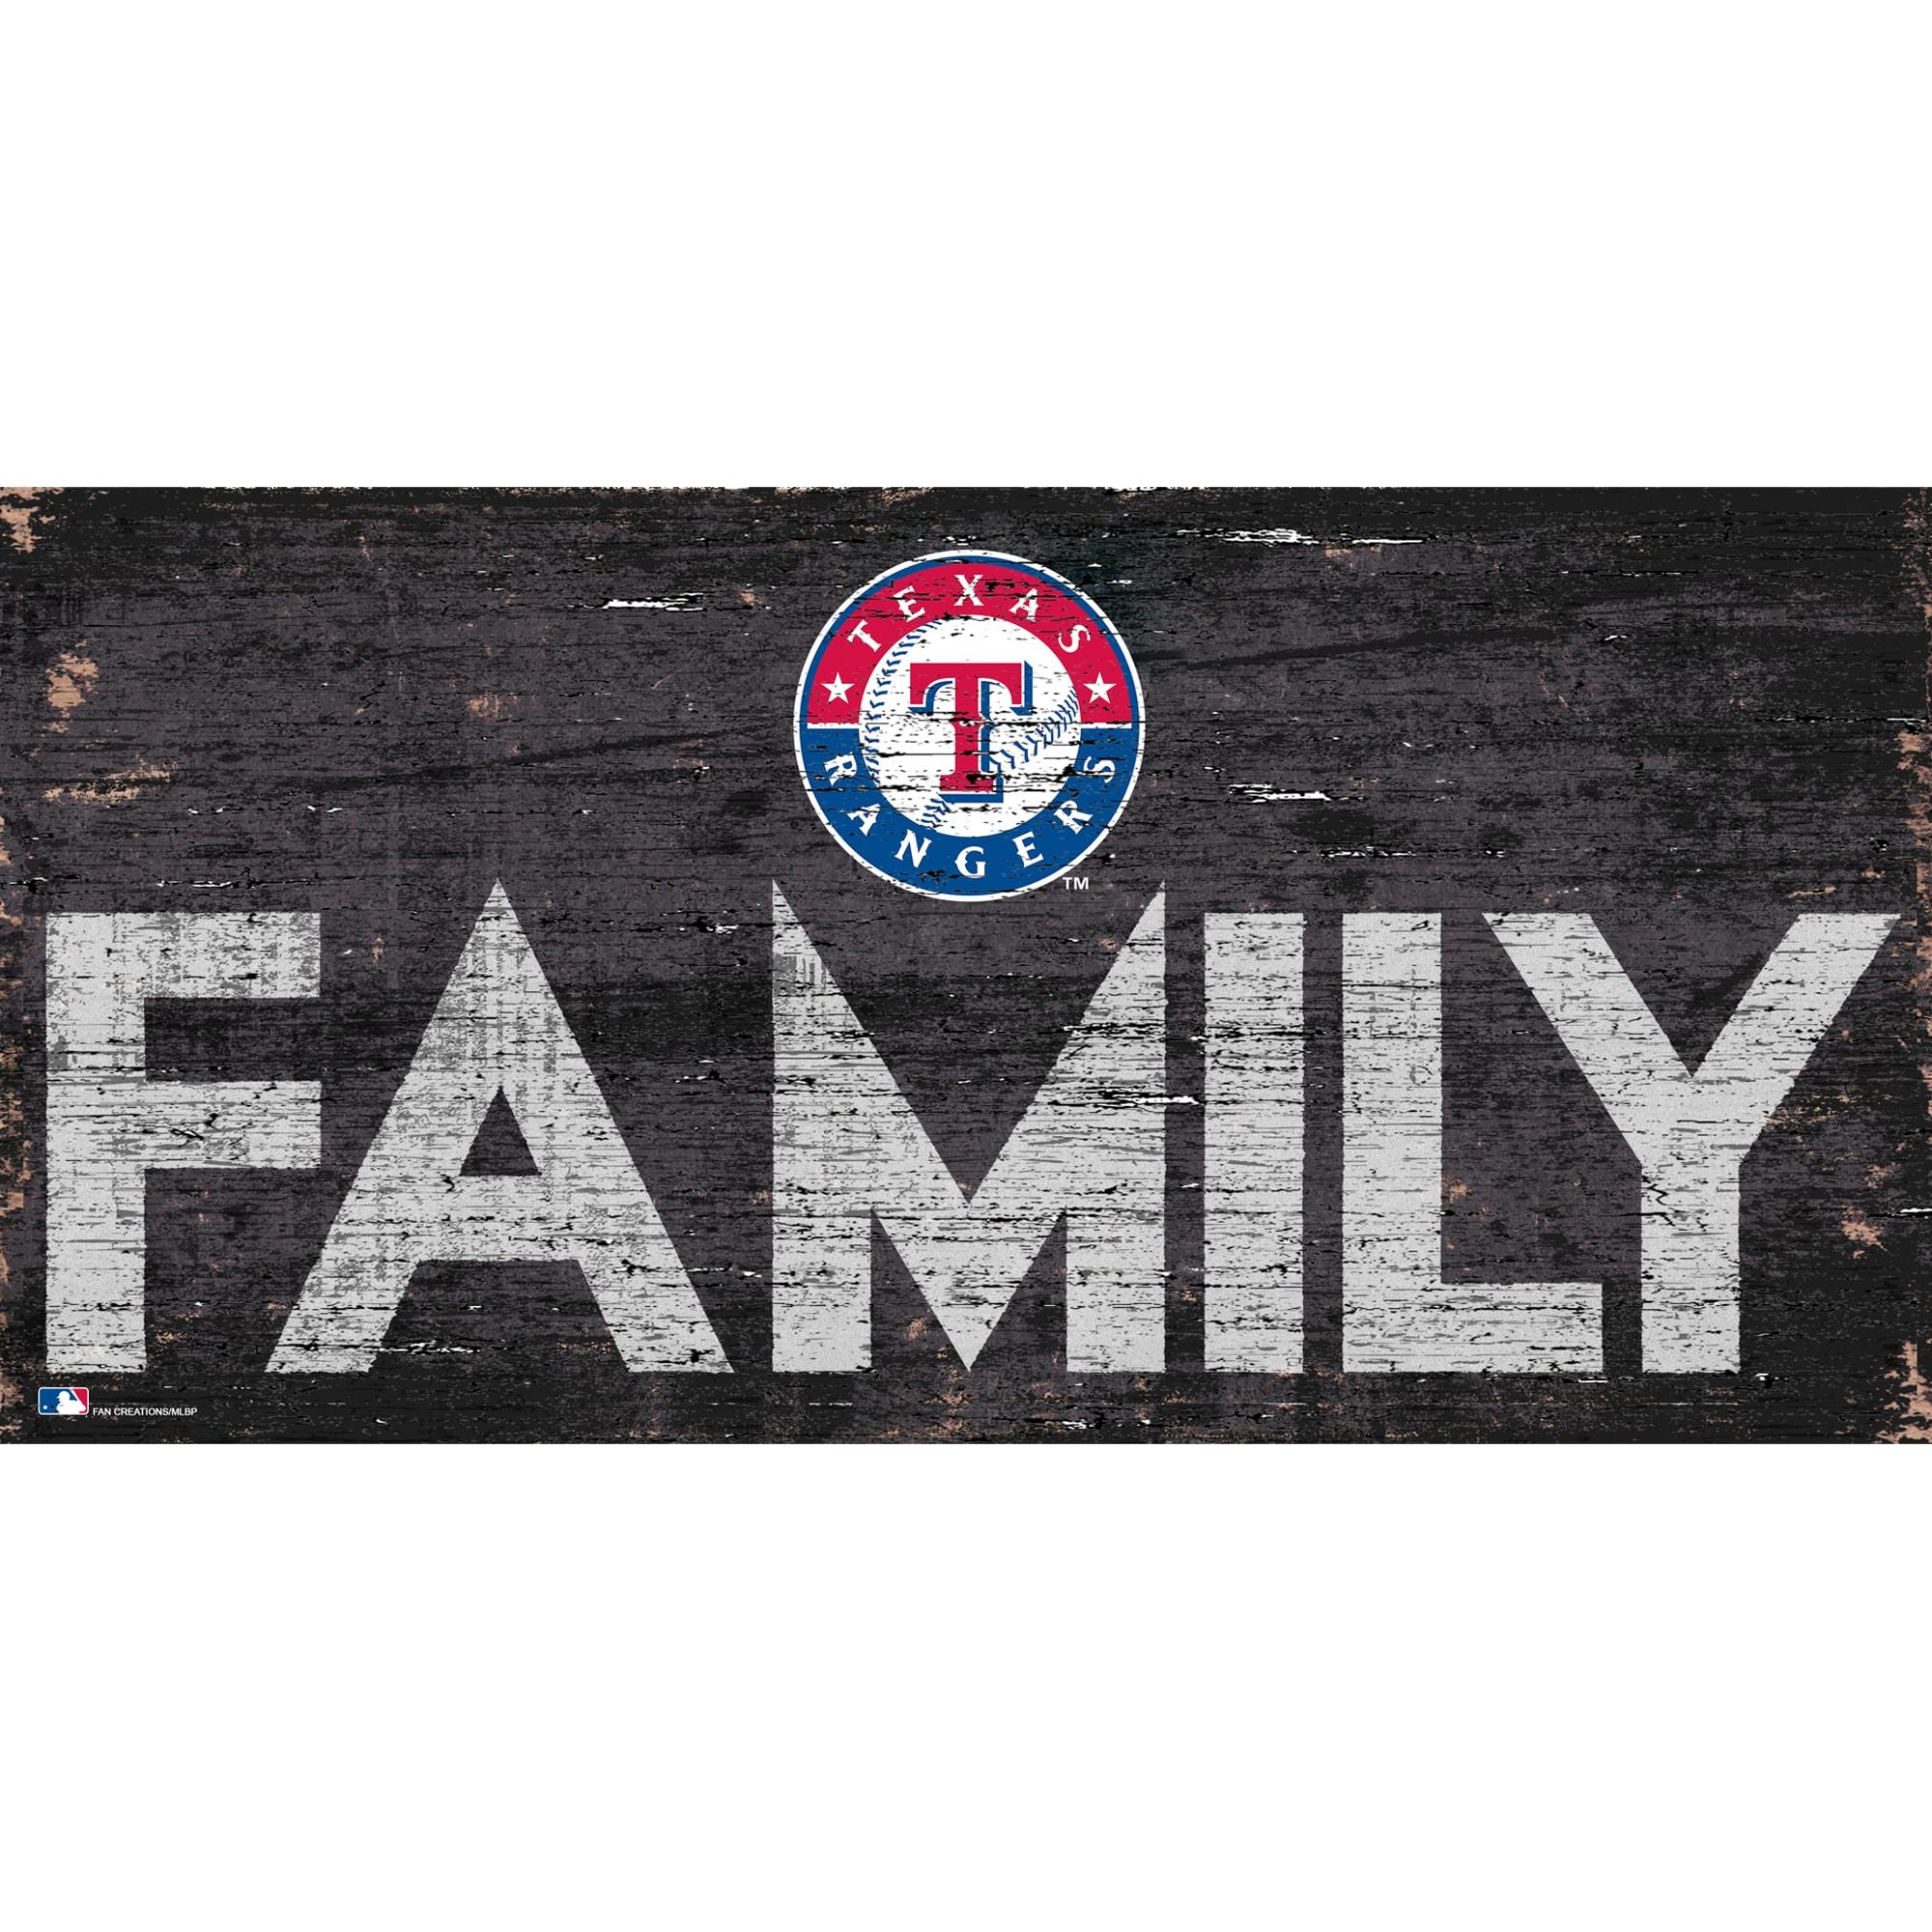 Texas Rangers 12'' x 6'' Family Sign